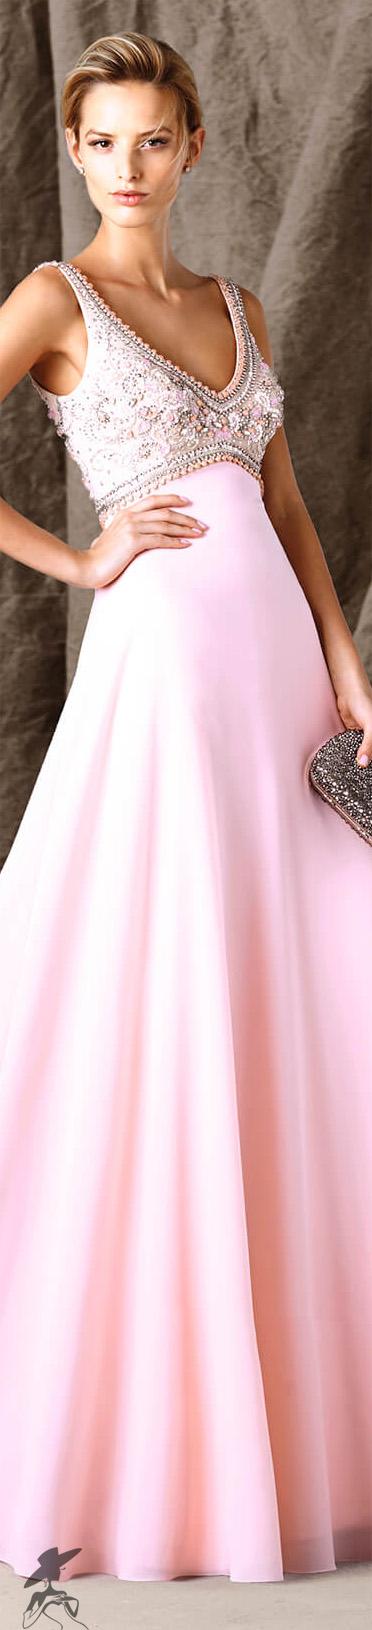 Style for warm weather gown prefer white Pronovias 2017